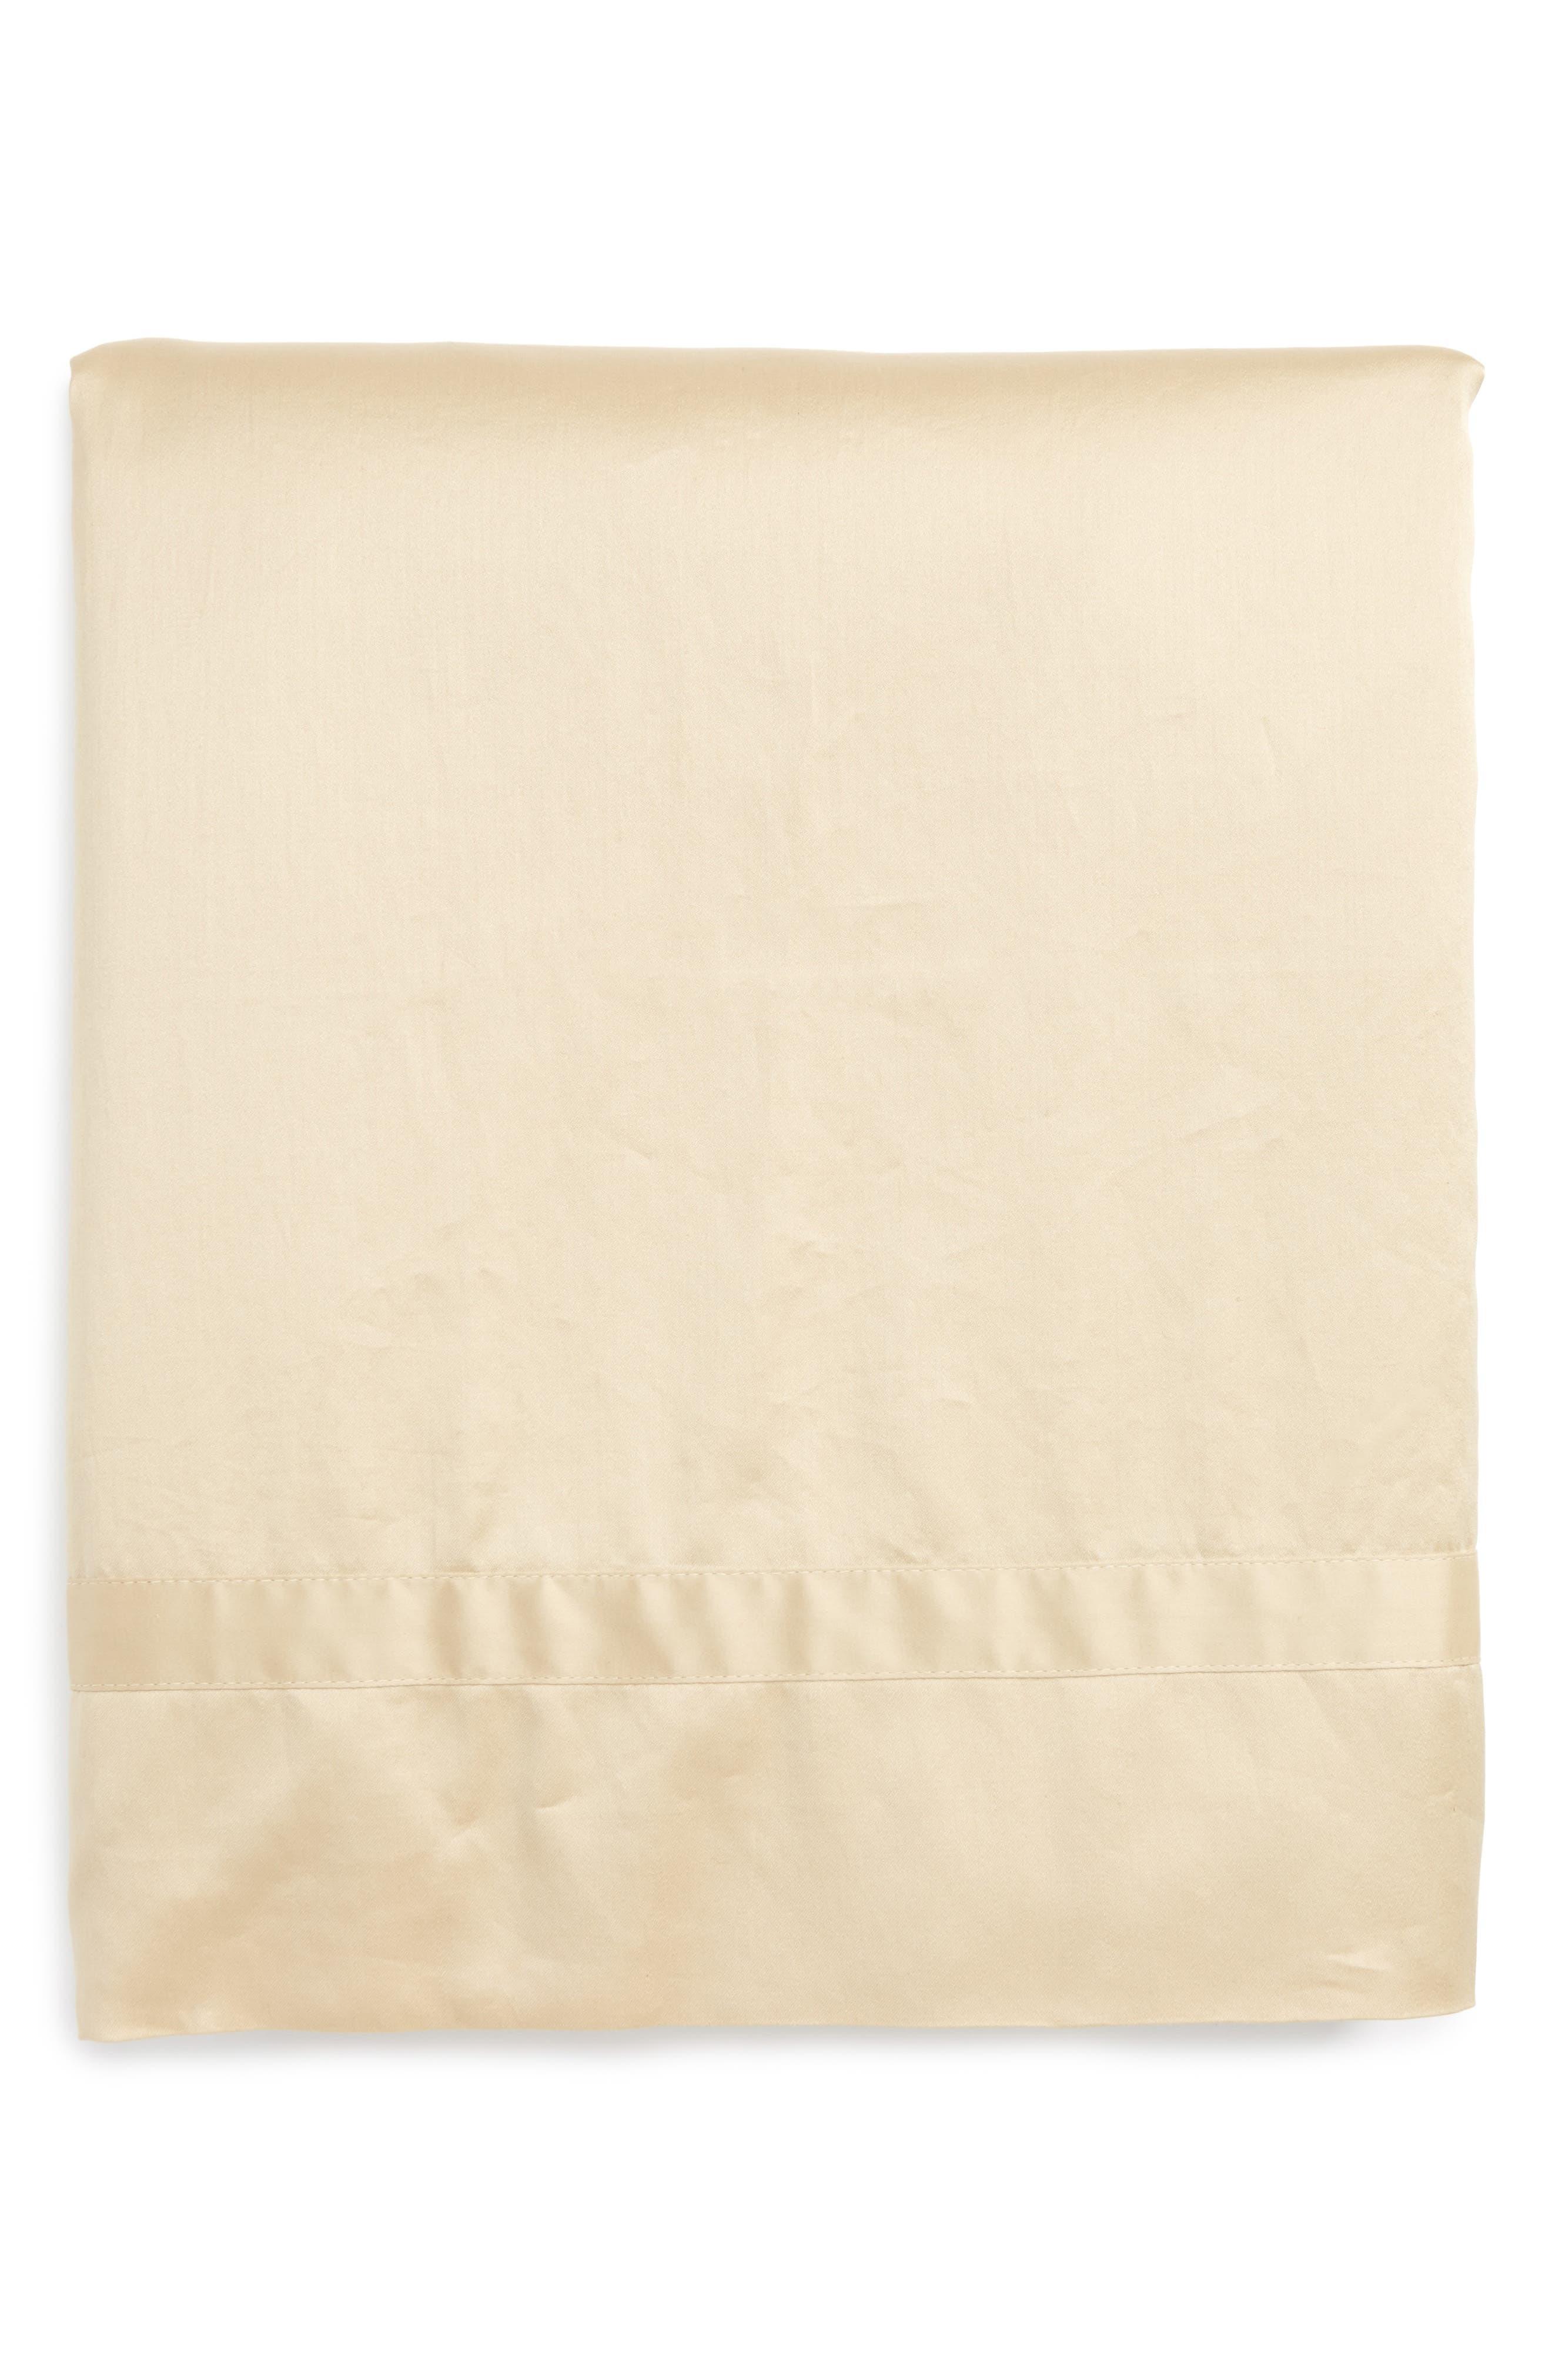 Main Image - Matouk Nocturne 600 Thread Count Flat Sheet